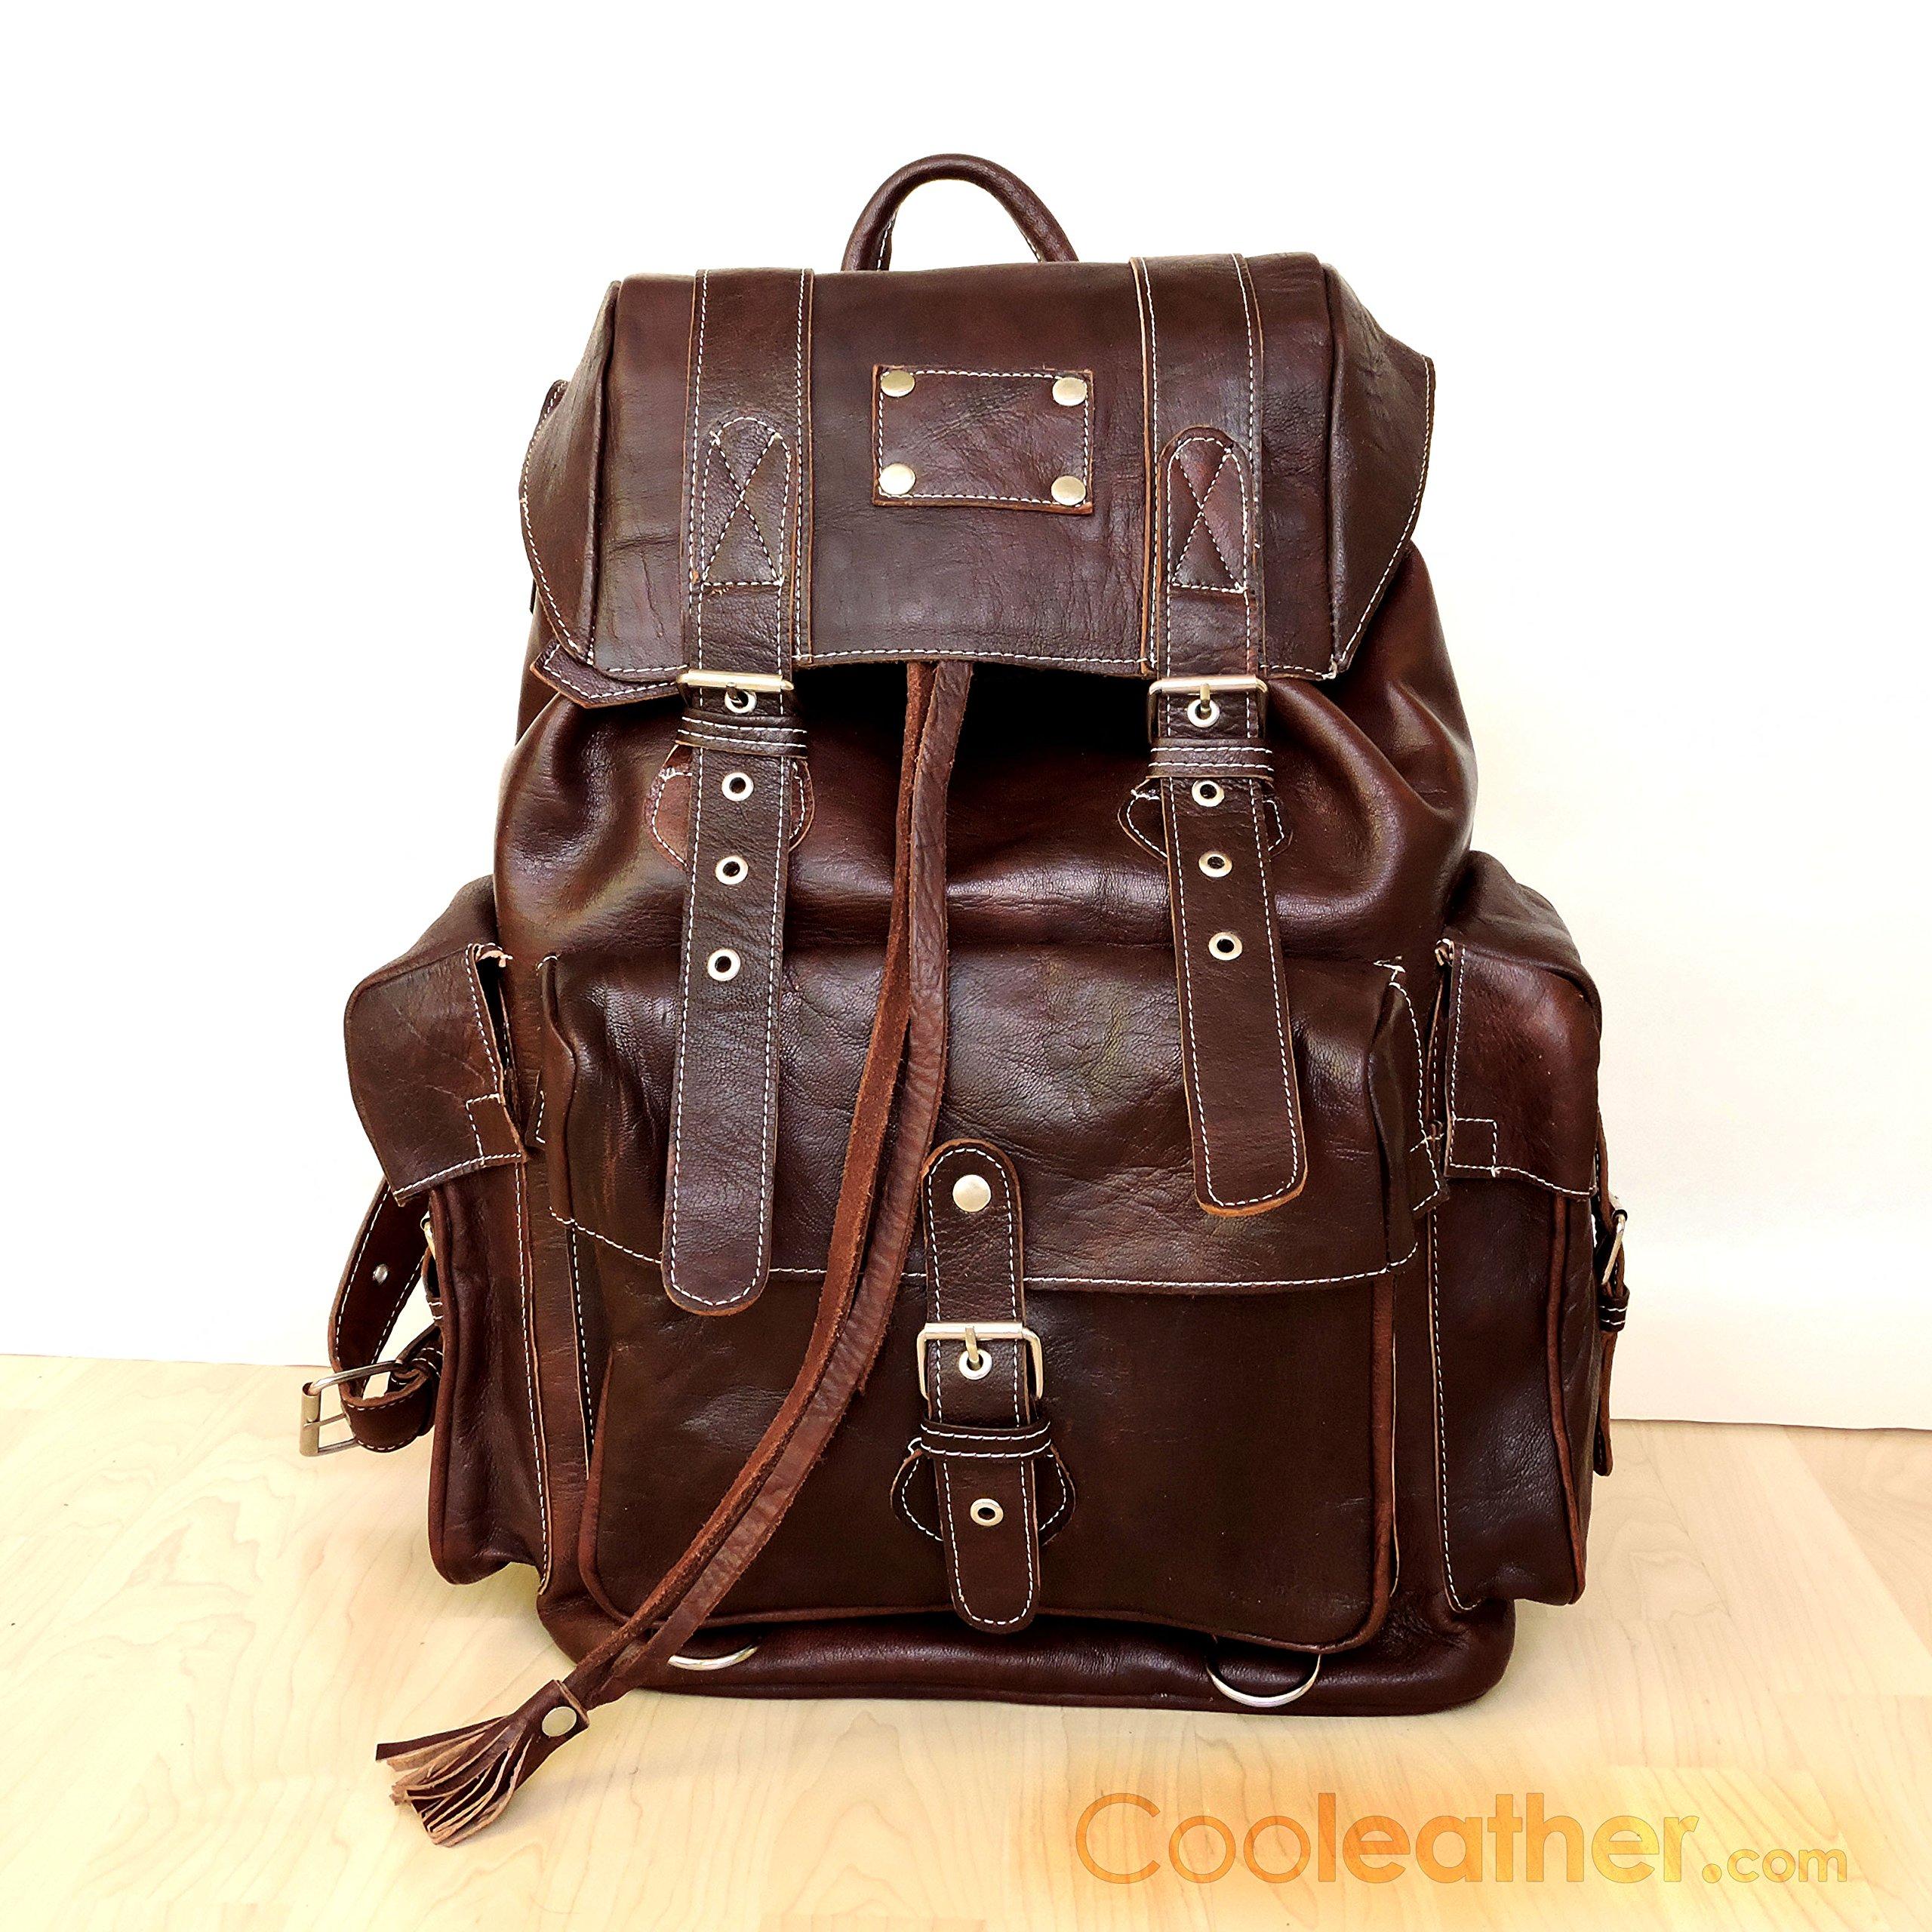 Handmade Extra Large Brown Leather Hiking Backpack, 23 Liters Travel Knapsack